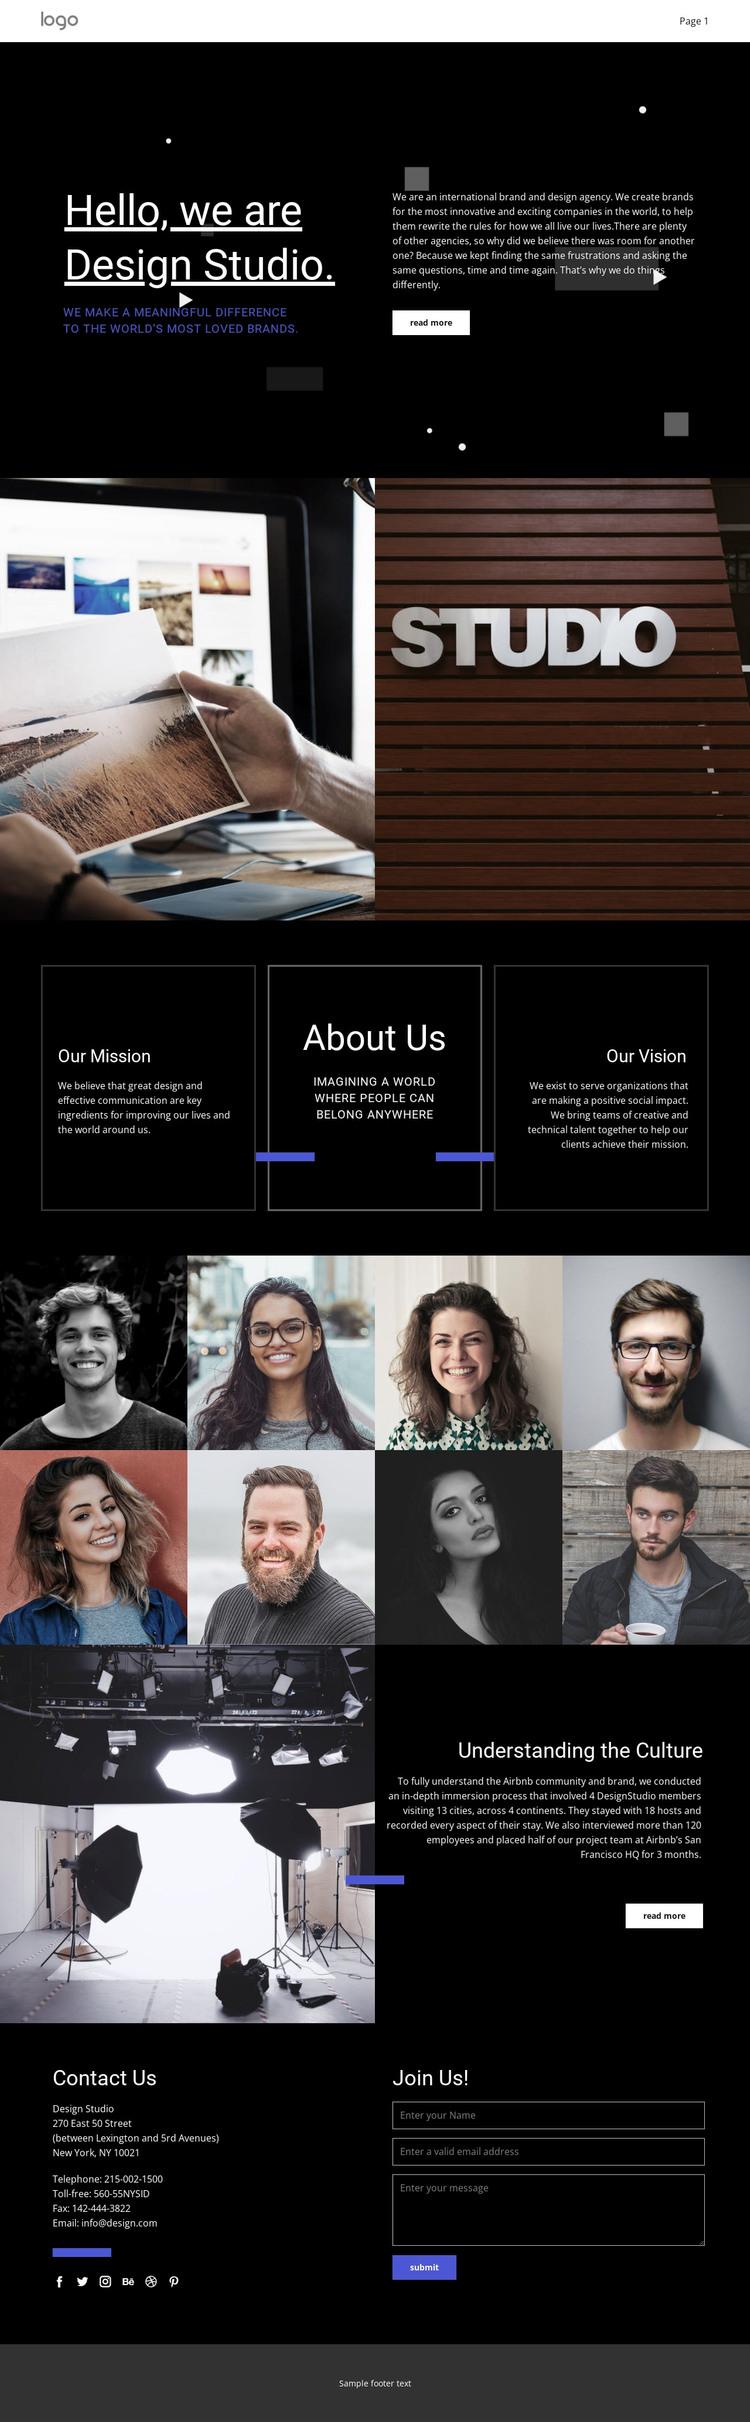 Our design is unique WordPress Theme